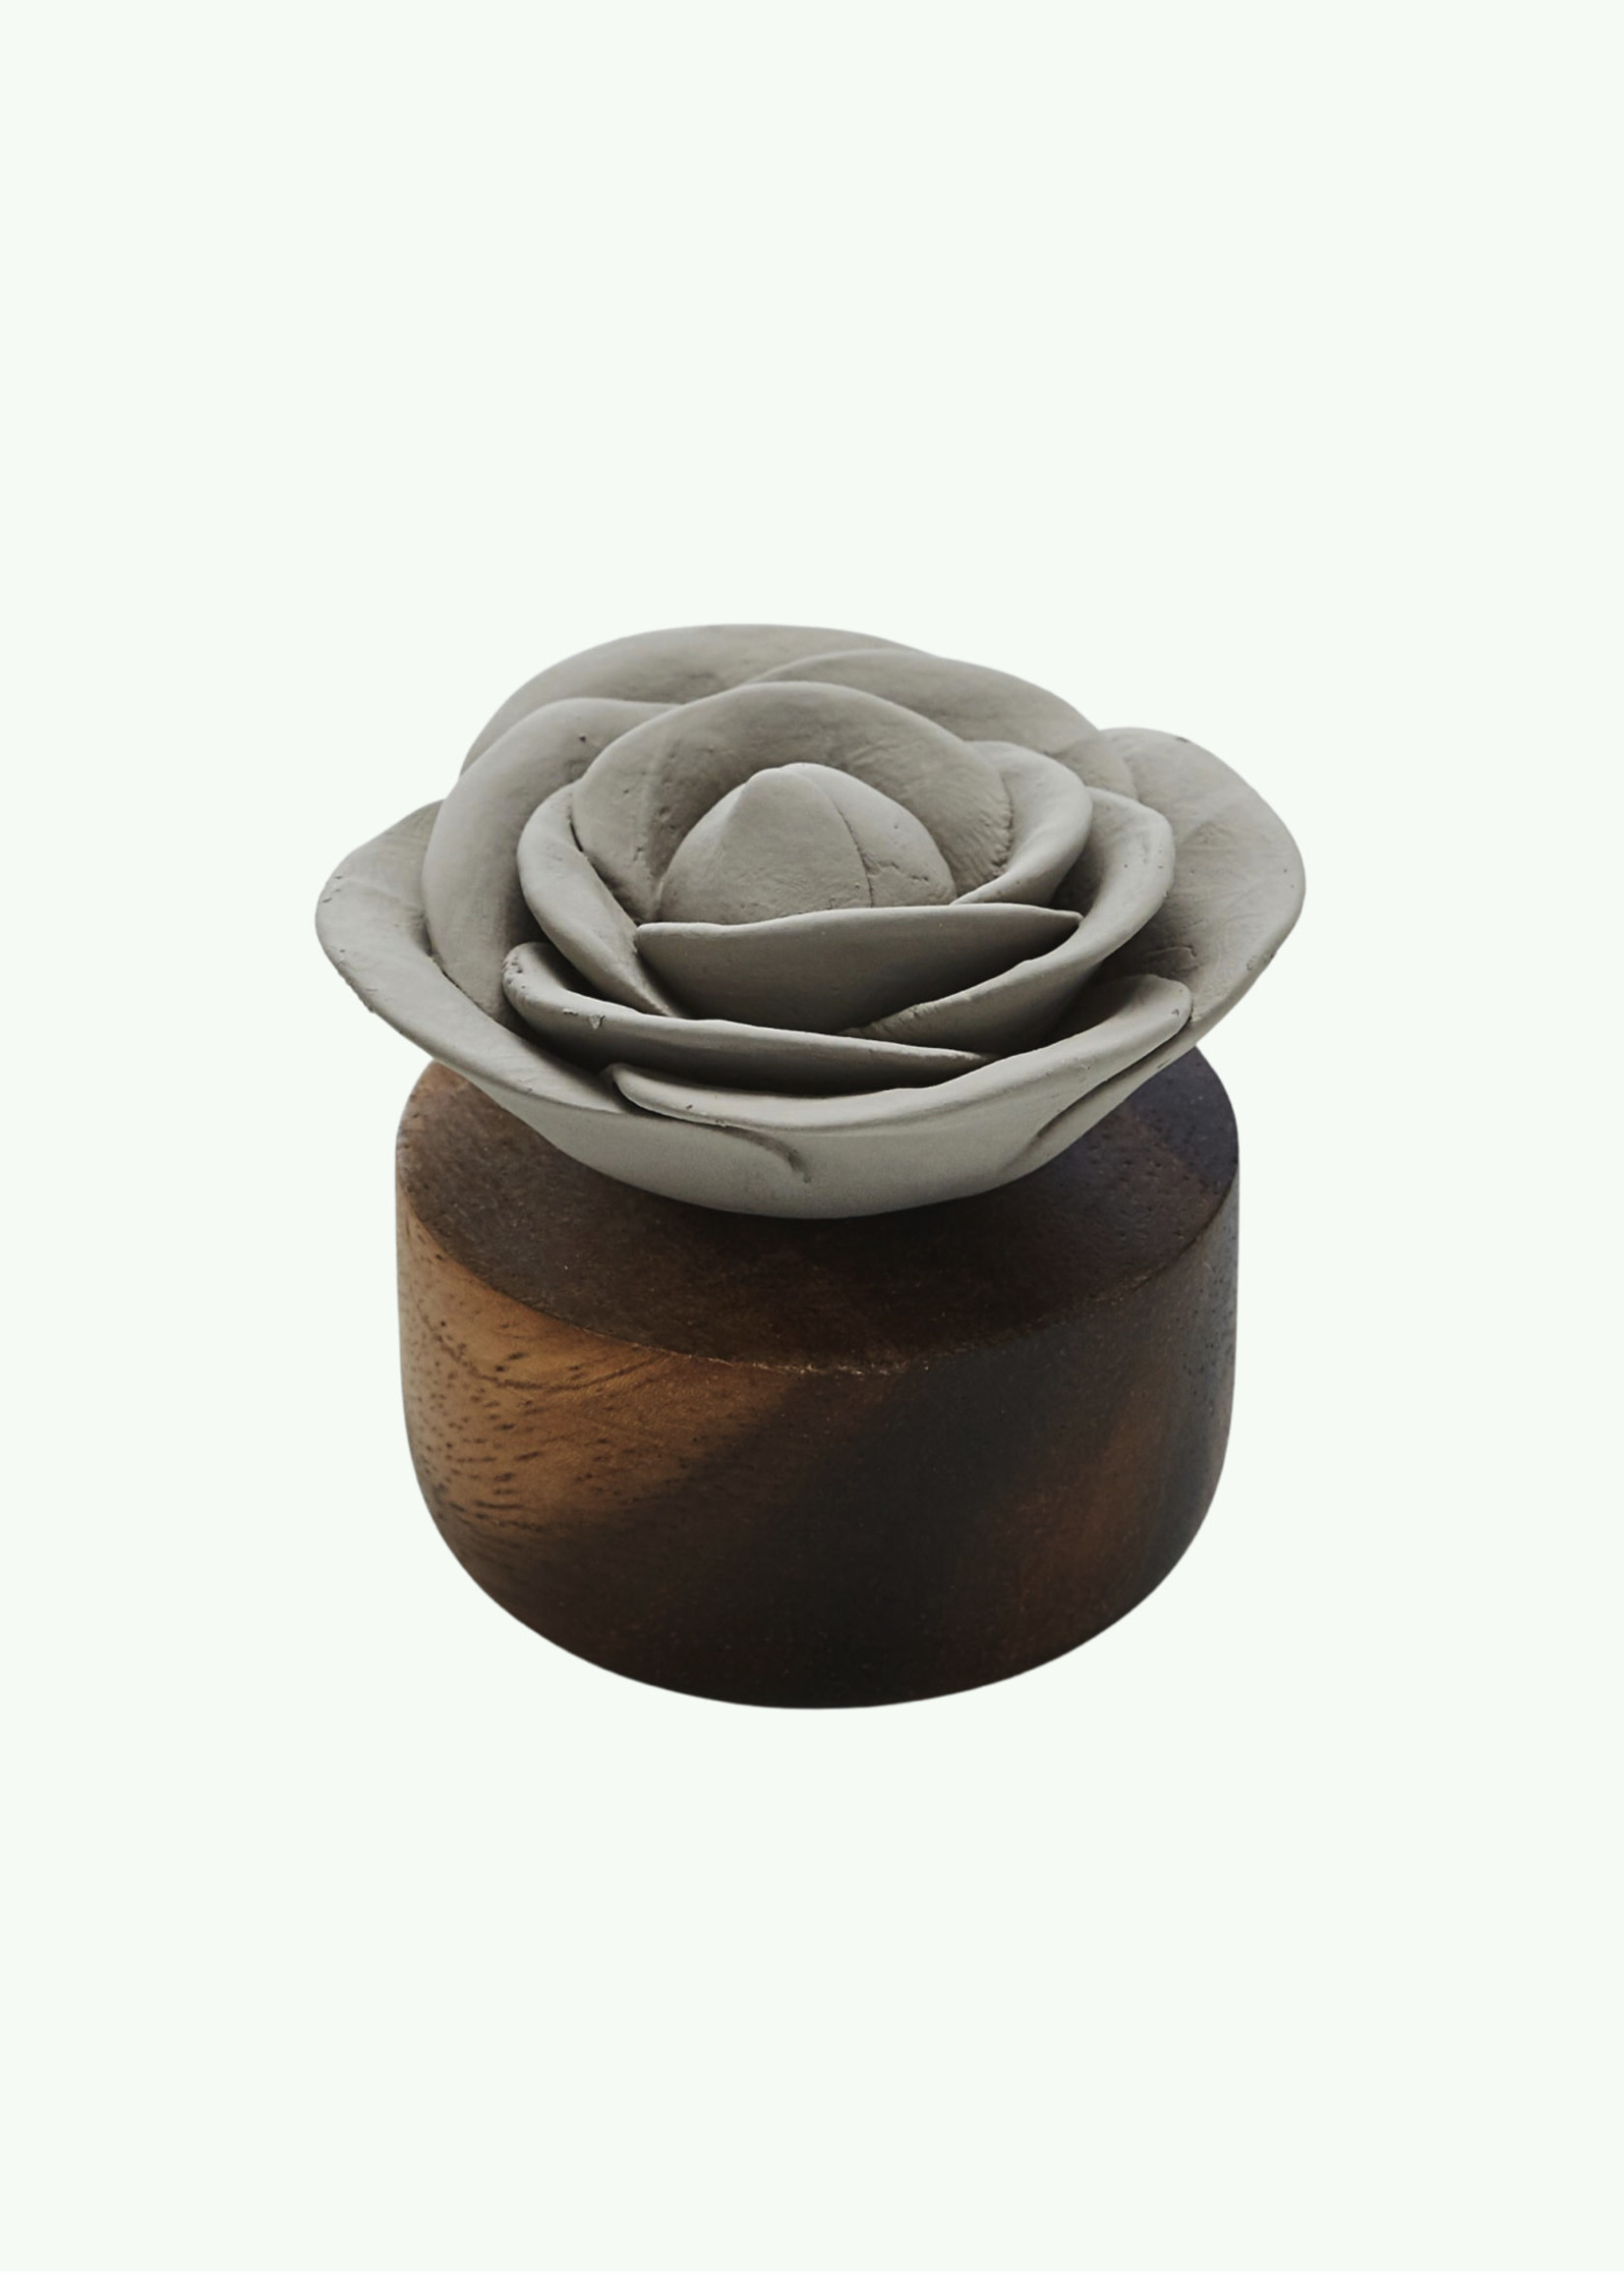 Anoq Anoq - Rose du Bengale - Perfume Diffuser